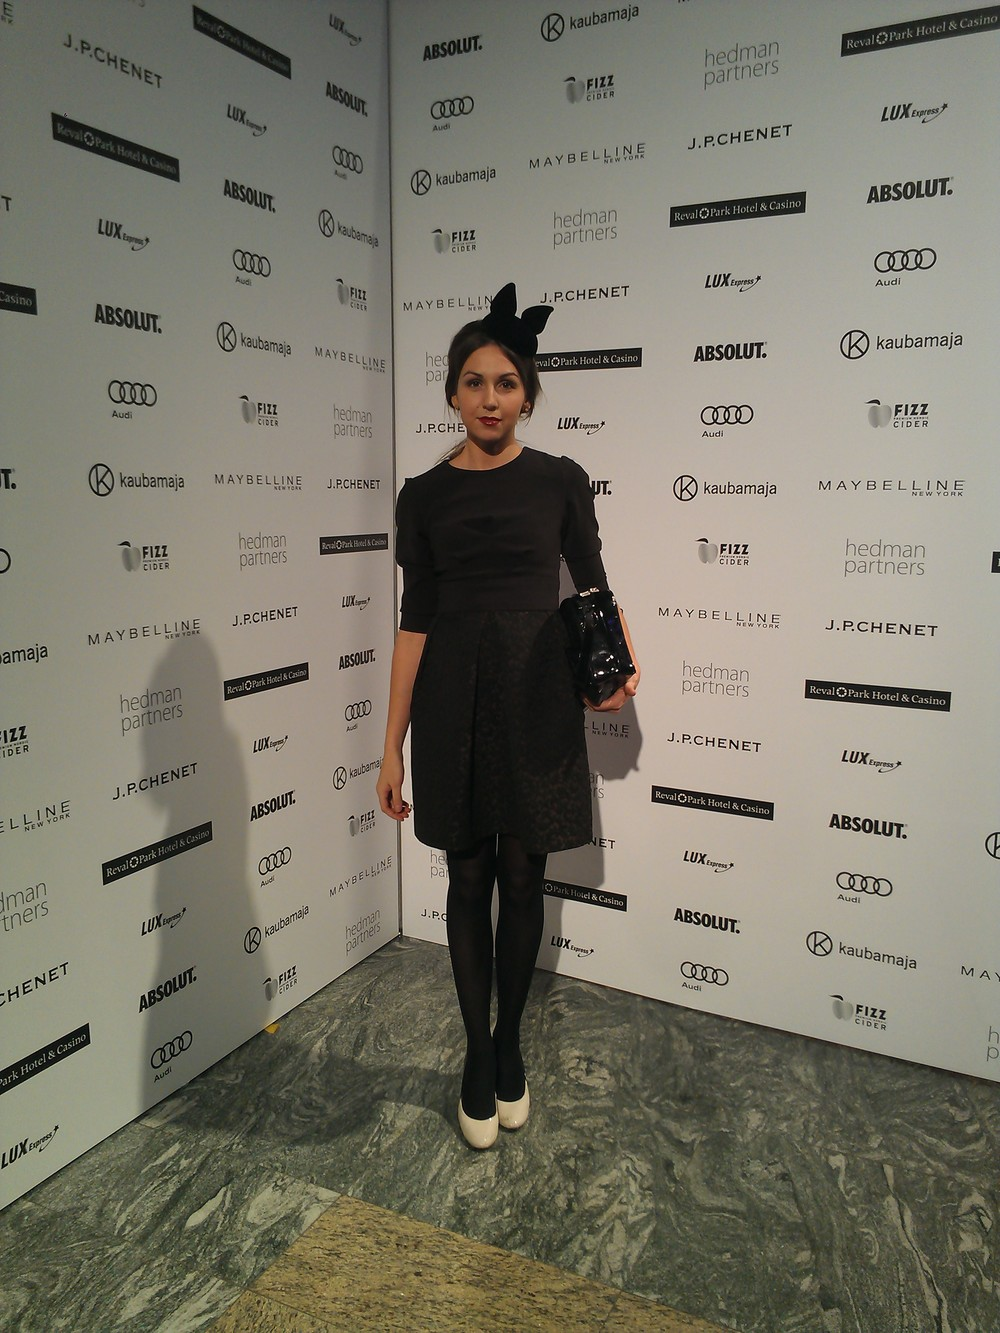 Estonian designer Vera Lustina